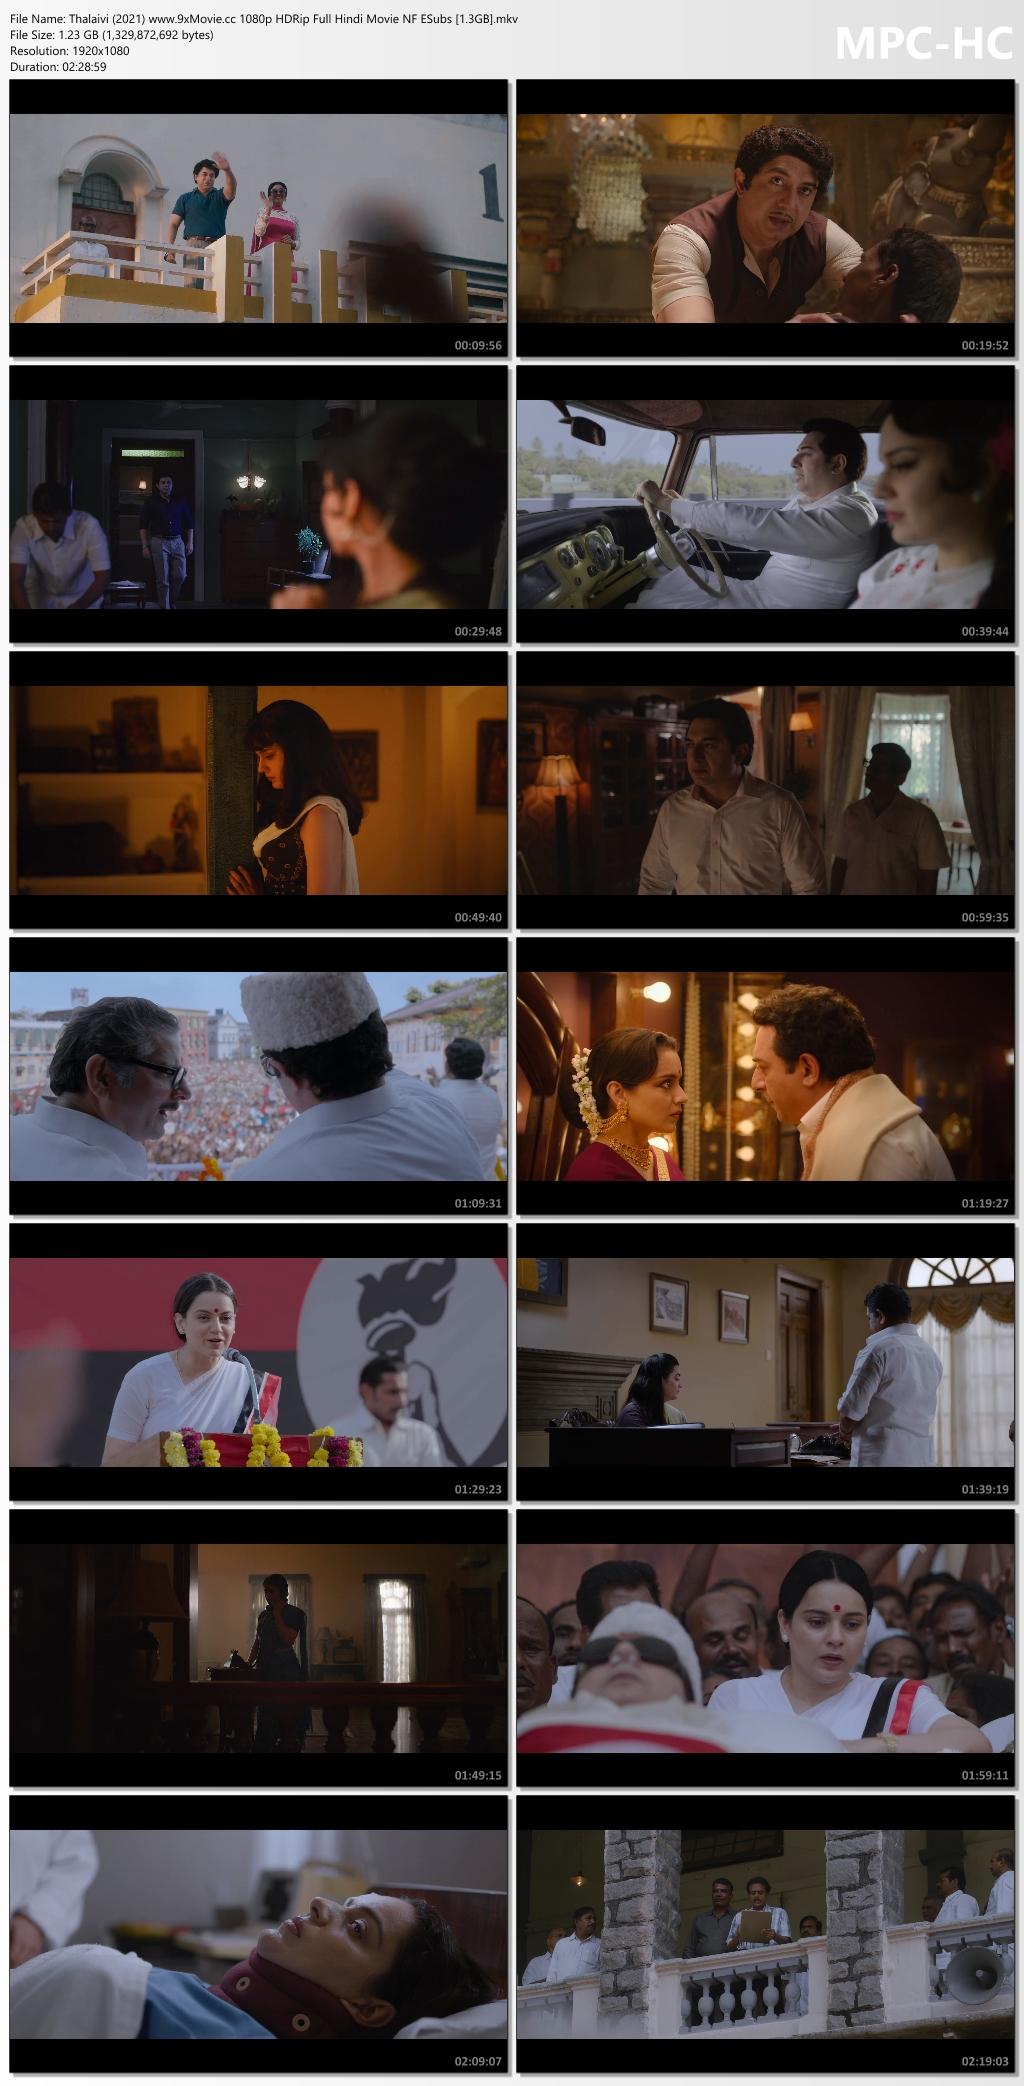 Thalaivi-2021-www-9x-Movie-cc-1080p-HDRip-Full-Hindi-Movie-NF-ESubs-1-3-GB-mkv